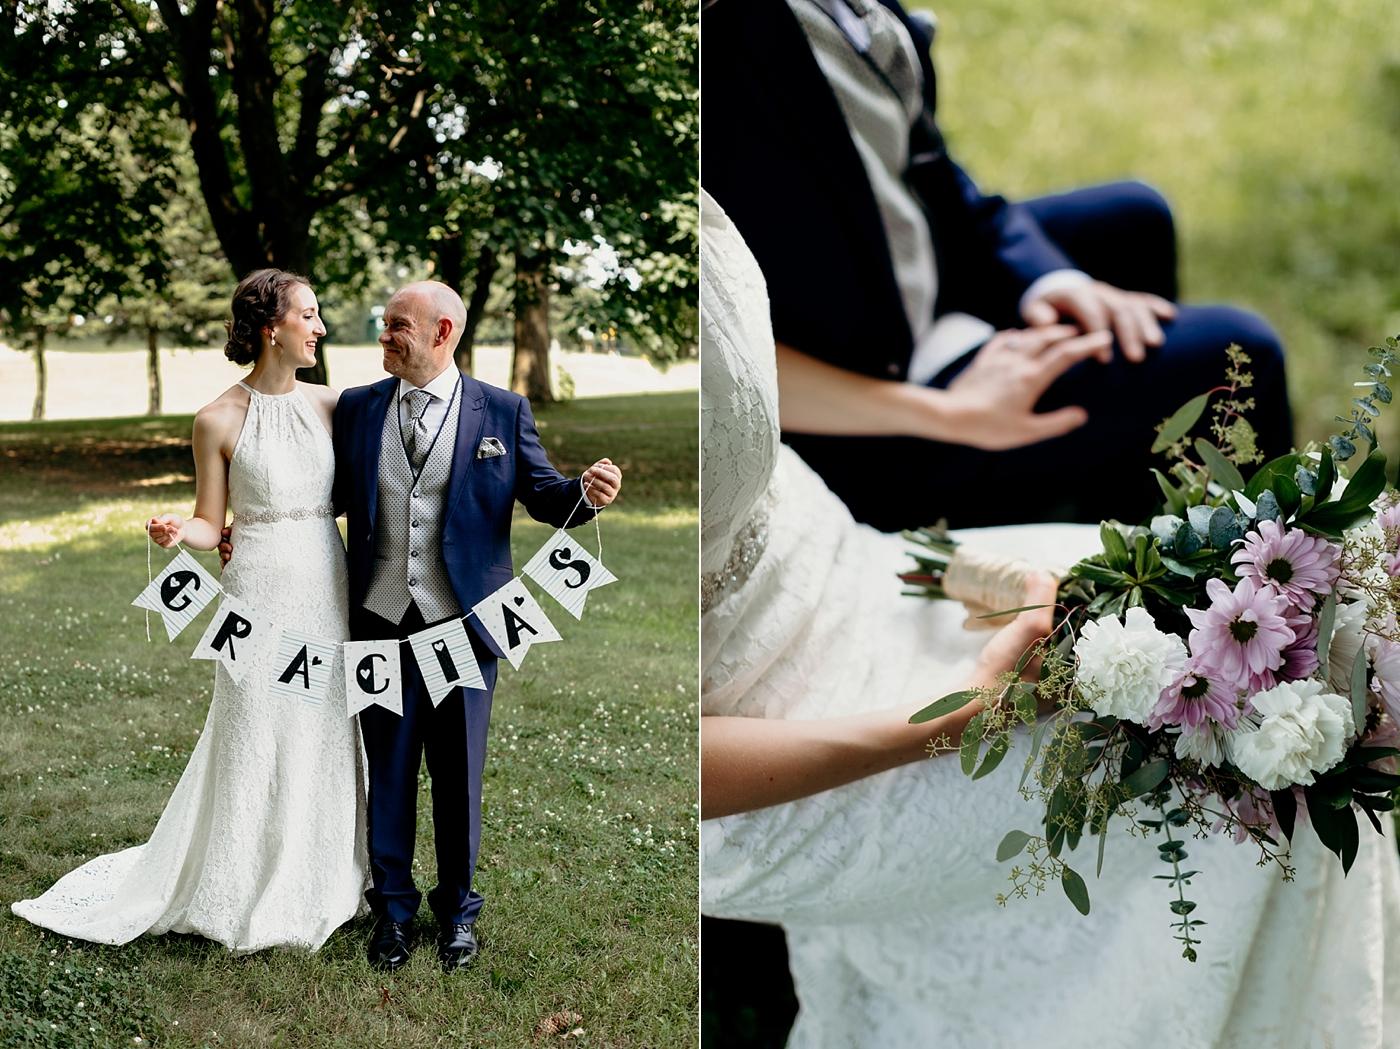 Chateau-Michelle-Wedding-Julia+JuanLuis_TheHeartlandersCo2018LA-83.jpg